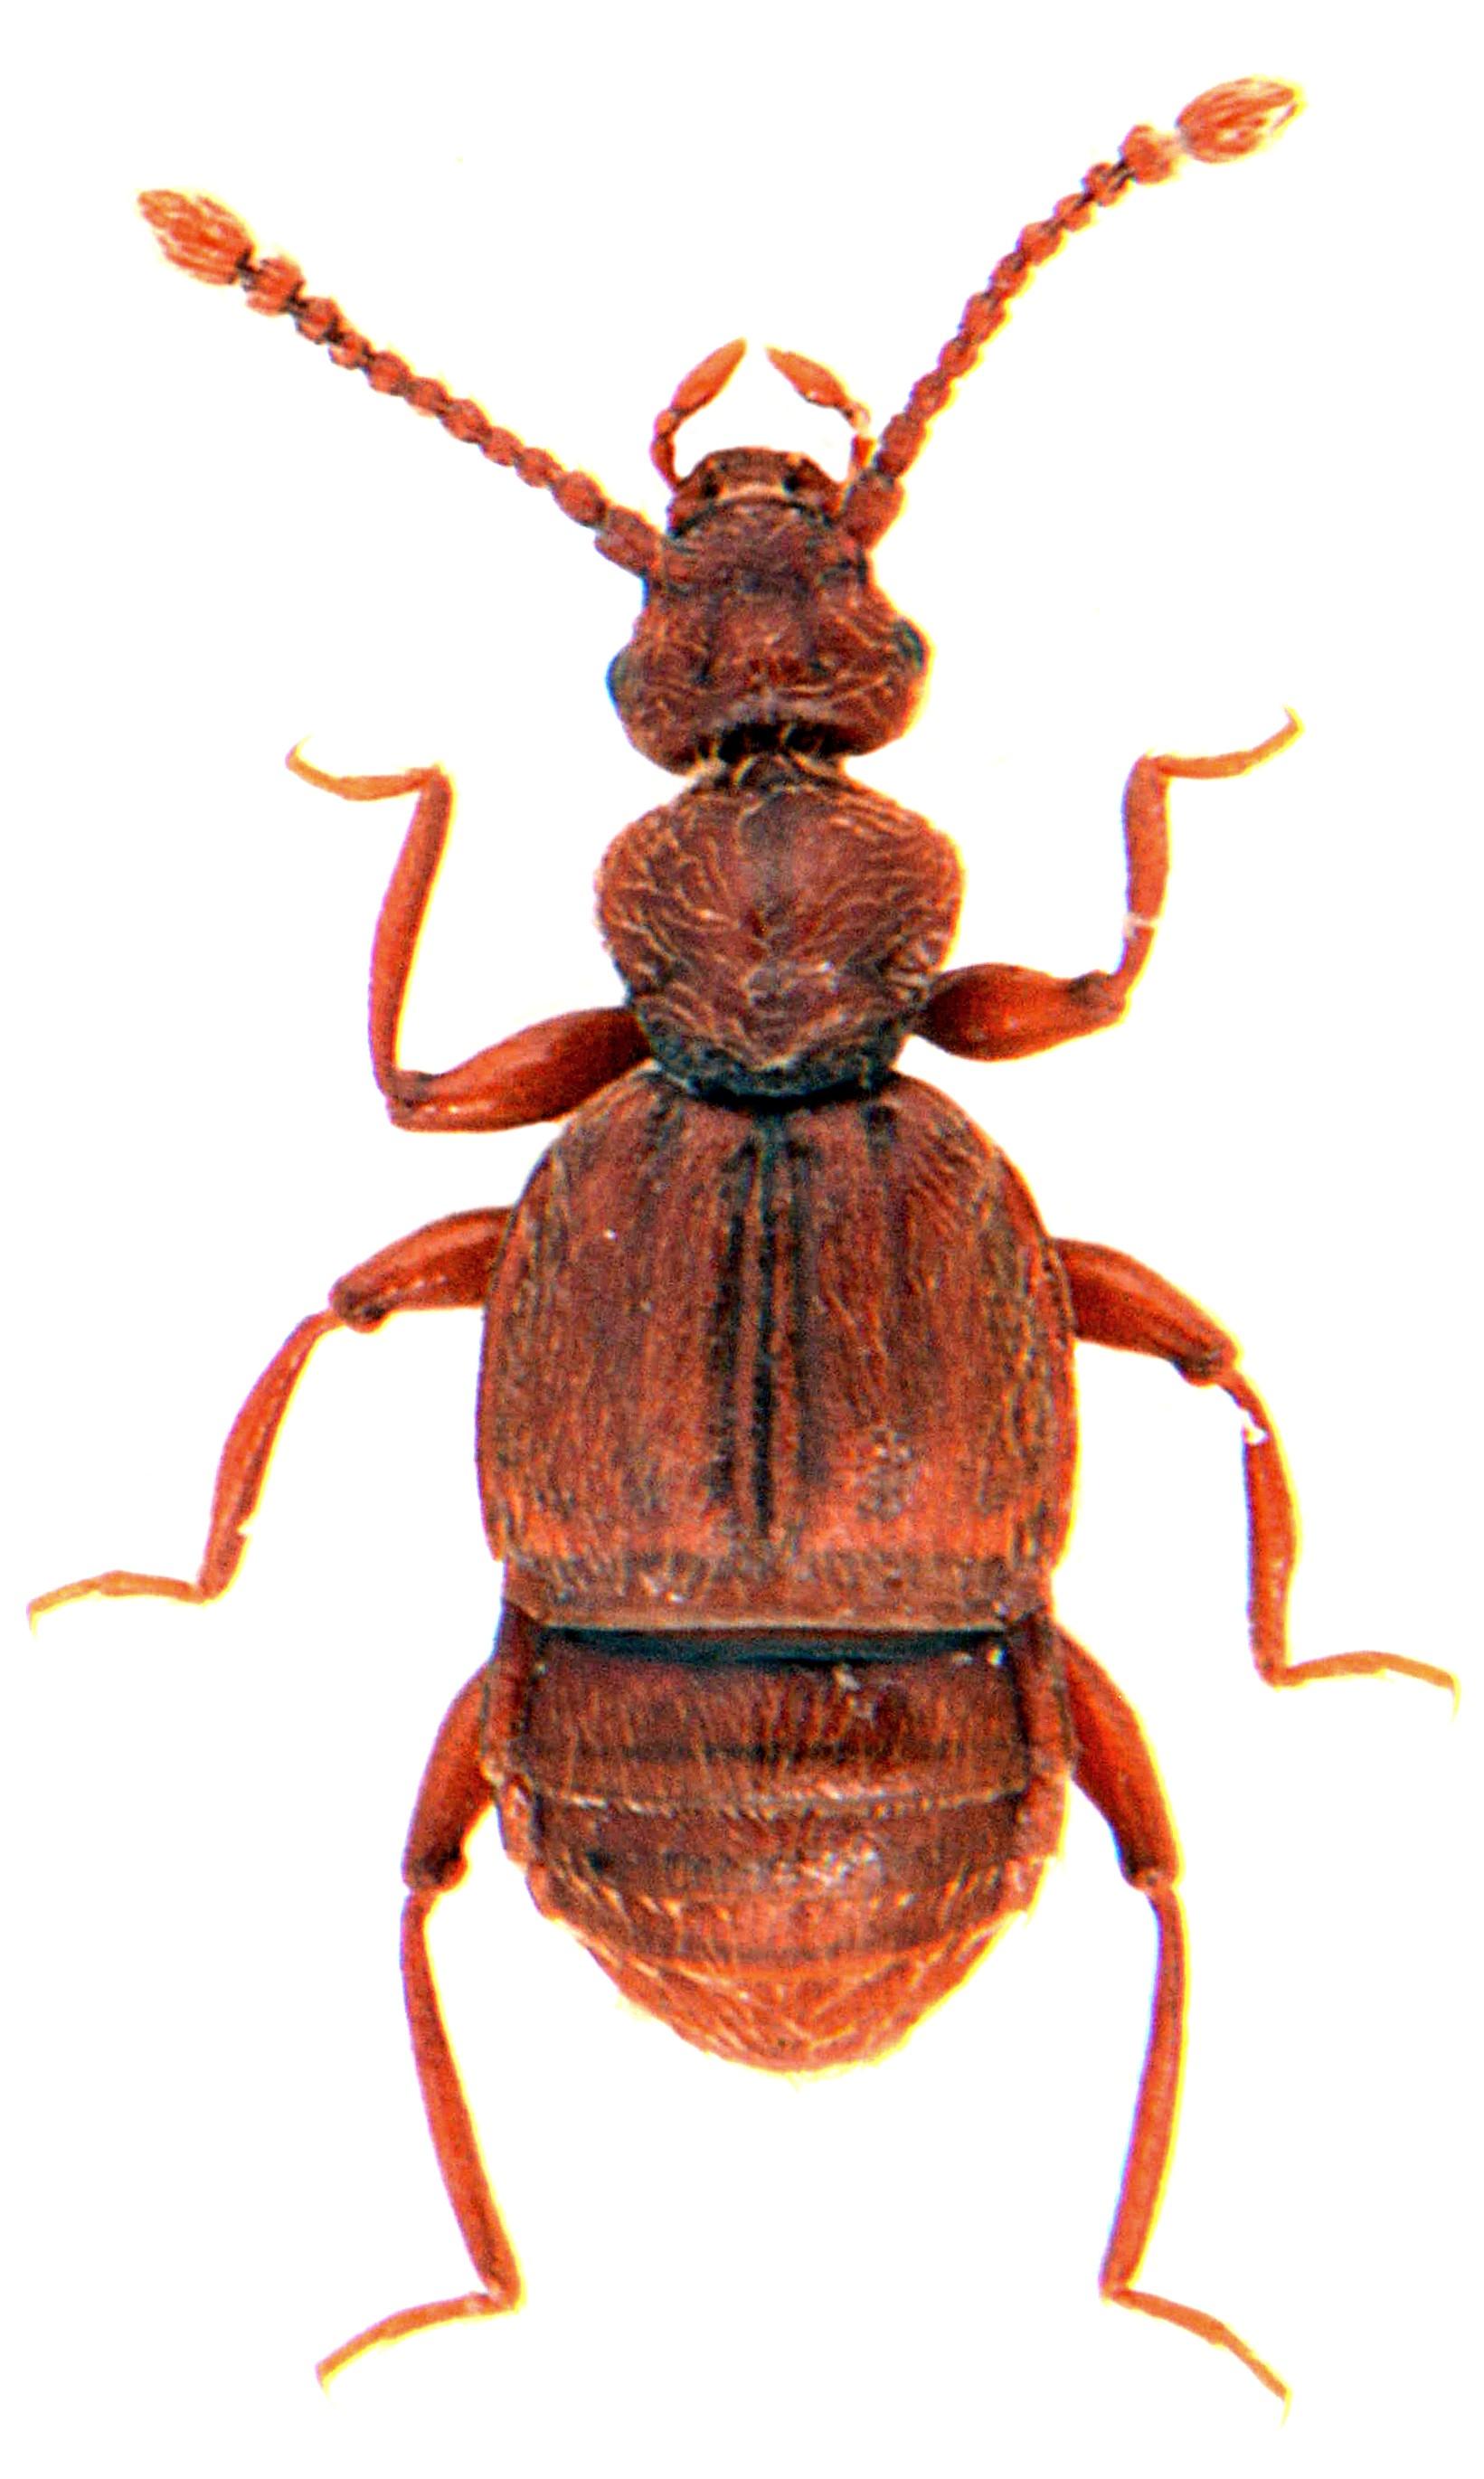 Trichonyx sulcicollis